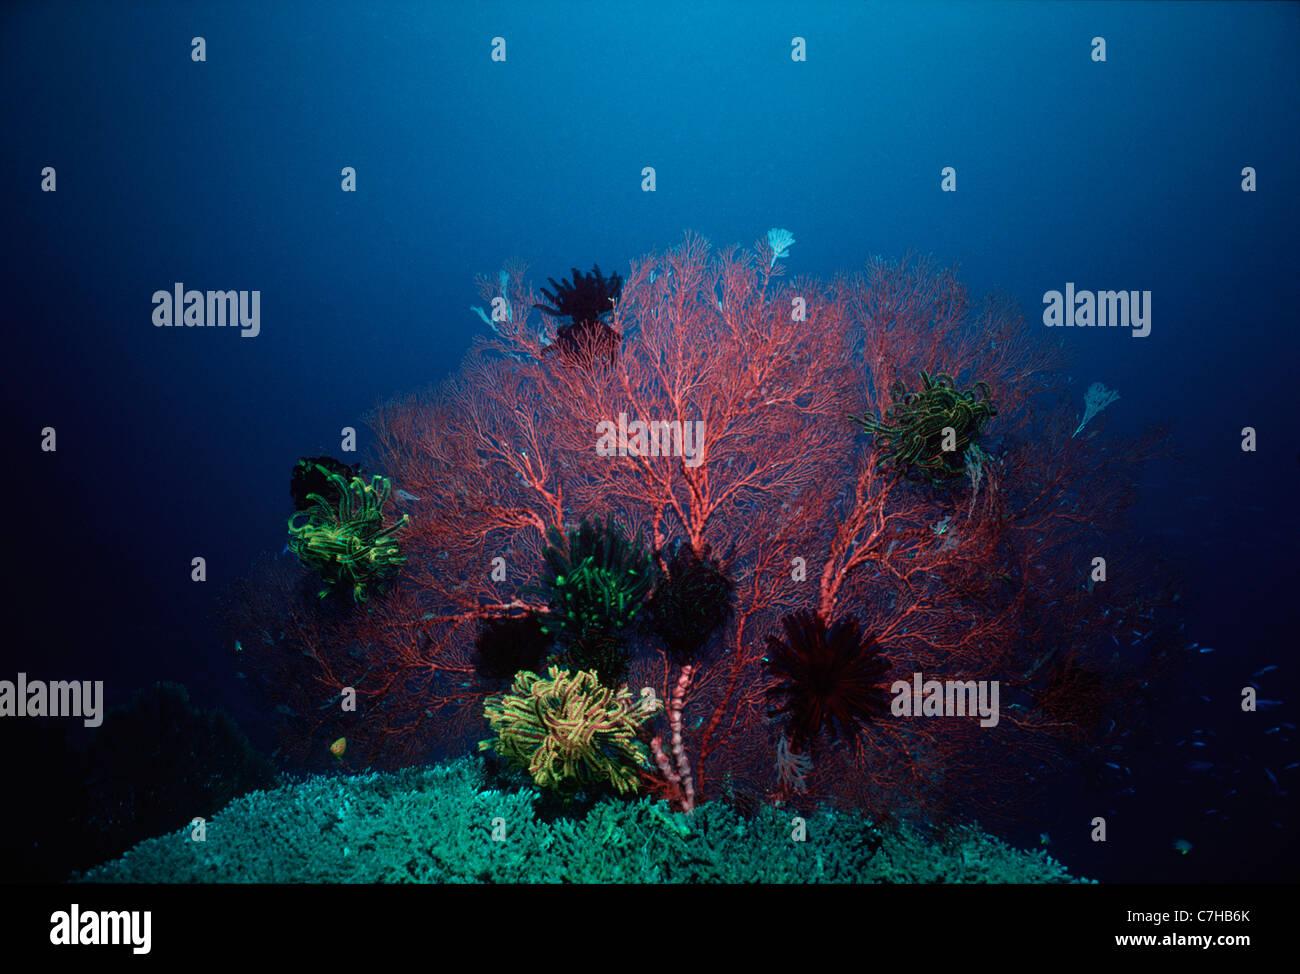 Crinoids on Gorgonian Coral (Melithaea spp.). Papua New Guinea - Bismarck Sea - Stock Image